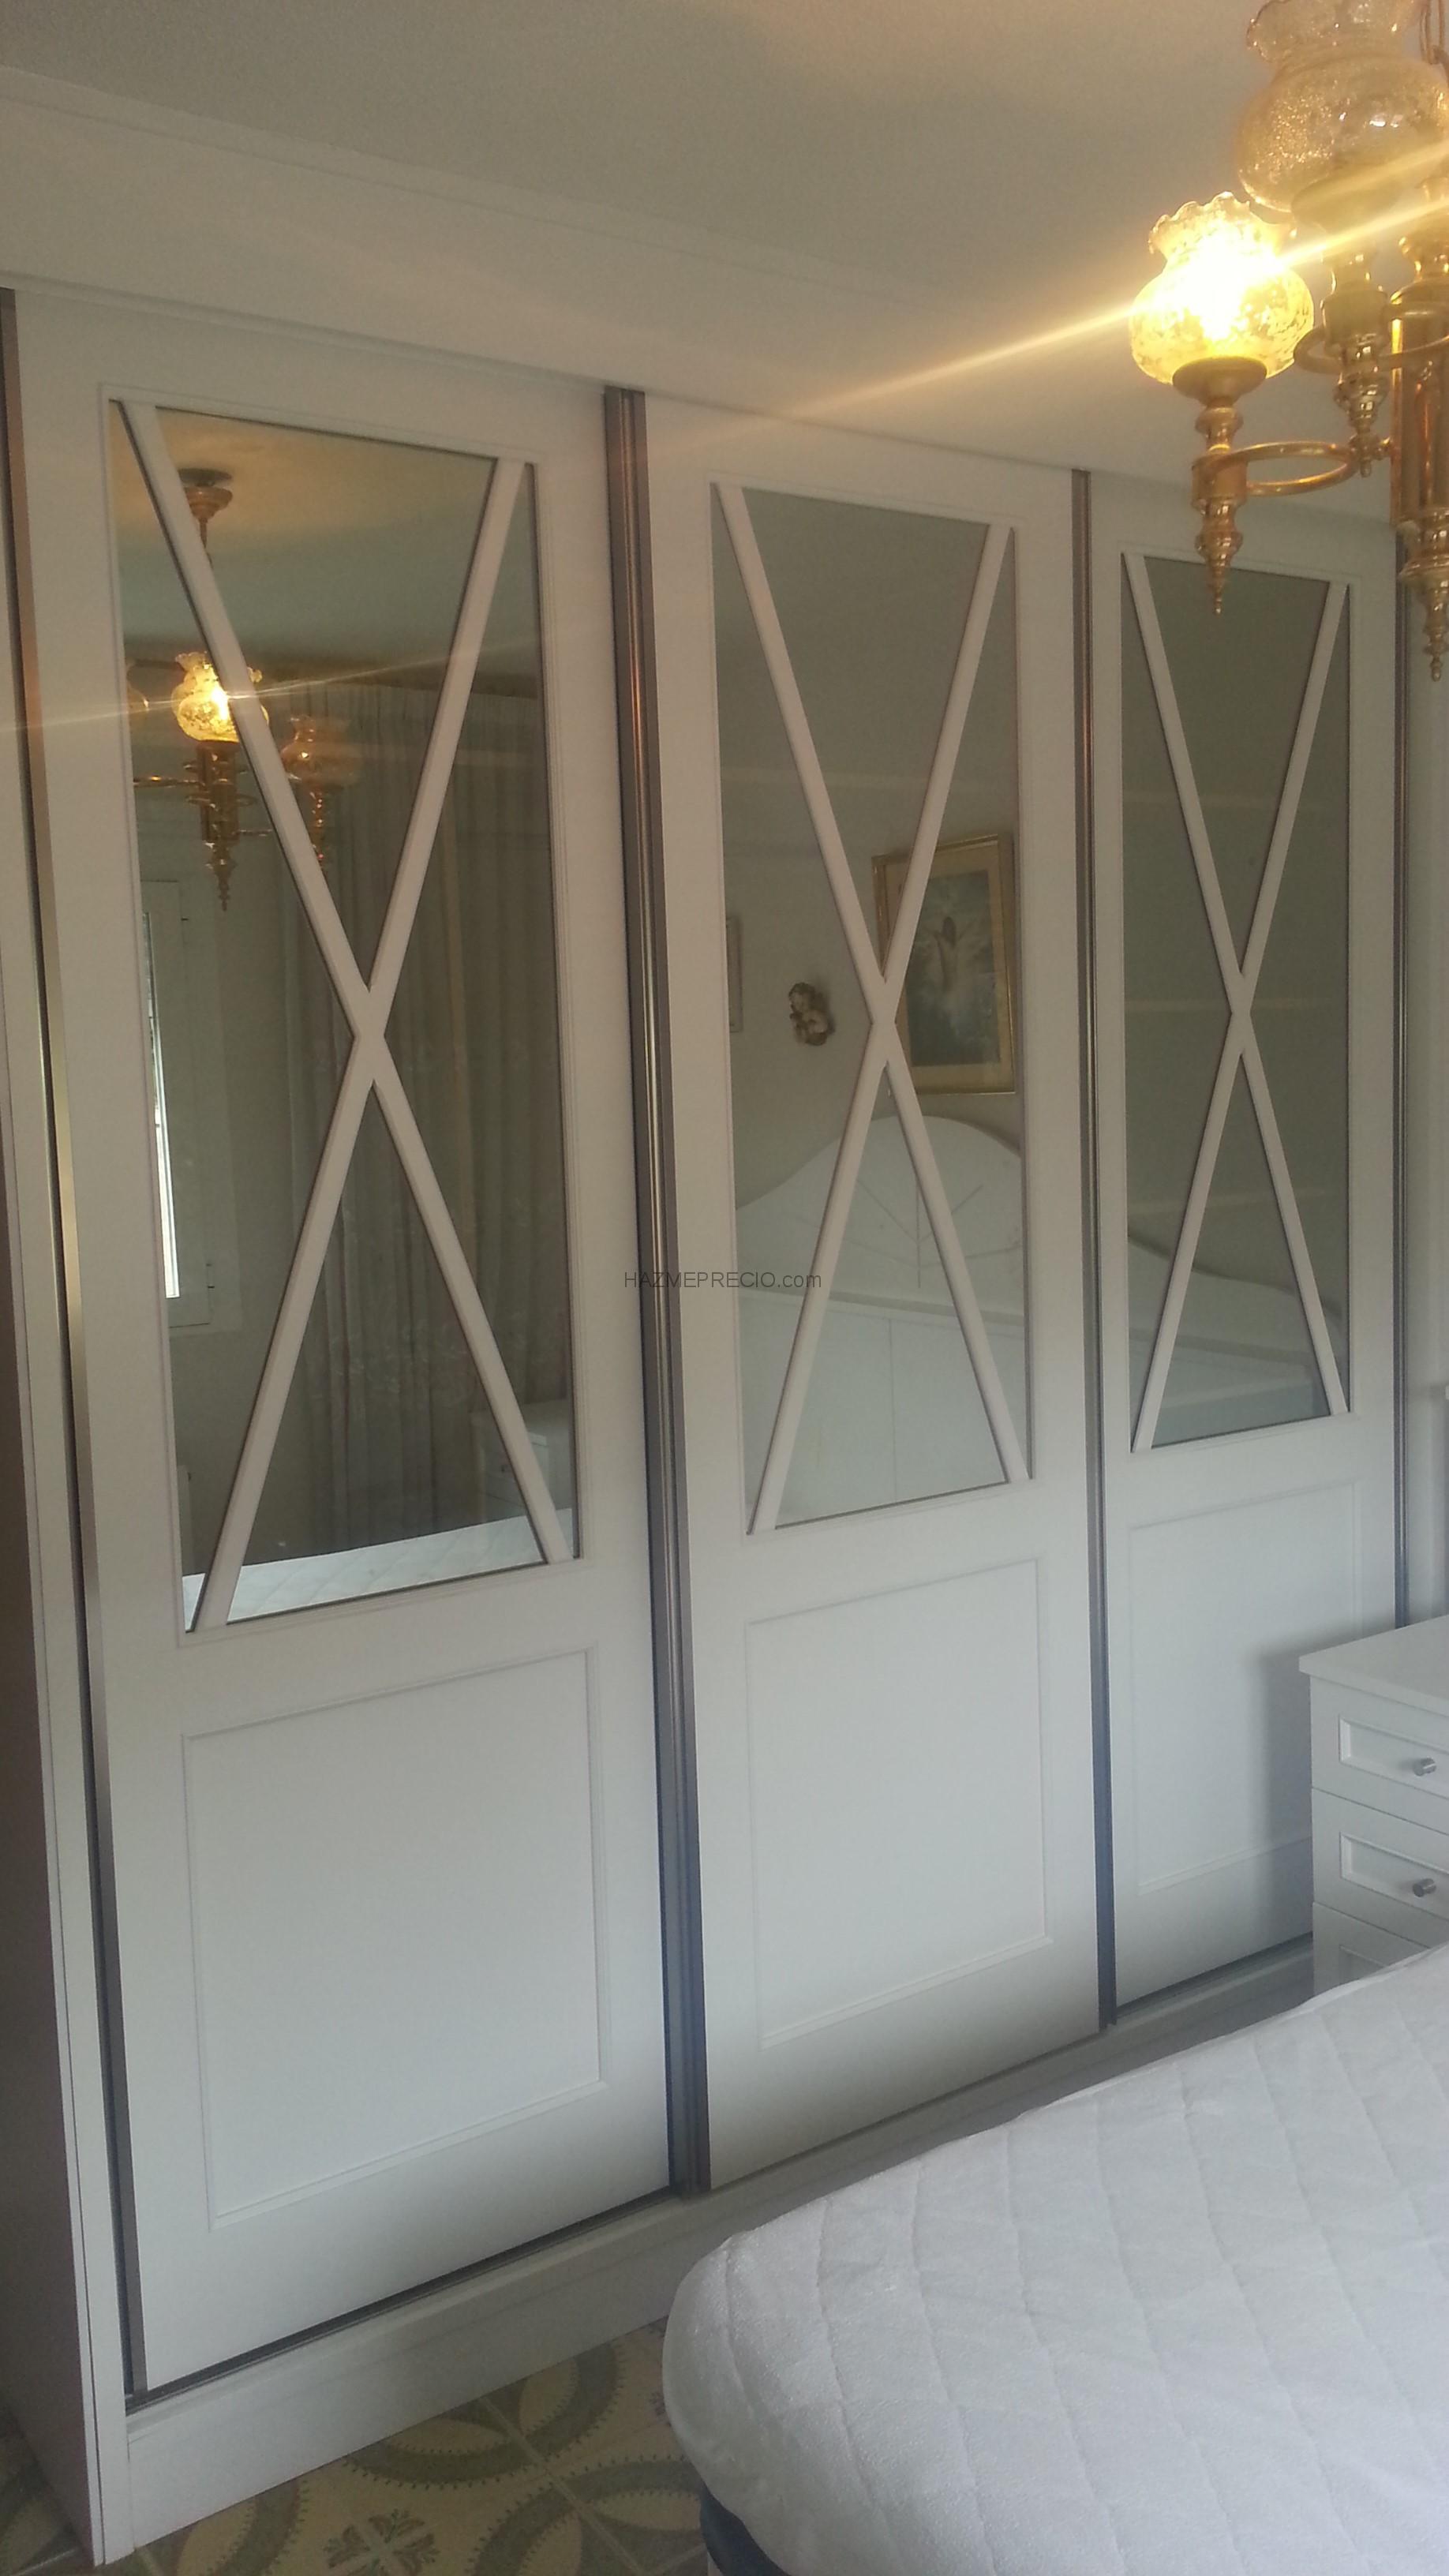 1000 images about armarios on pinterest alicante for Puertas correderas de cristal